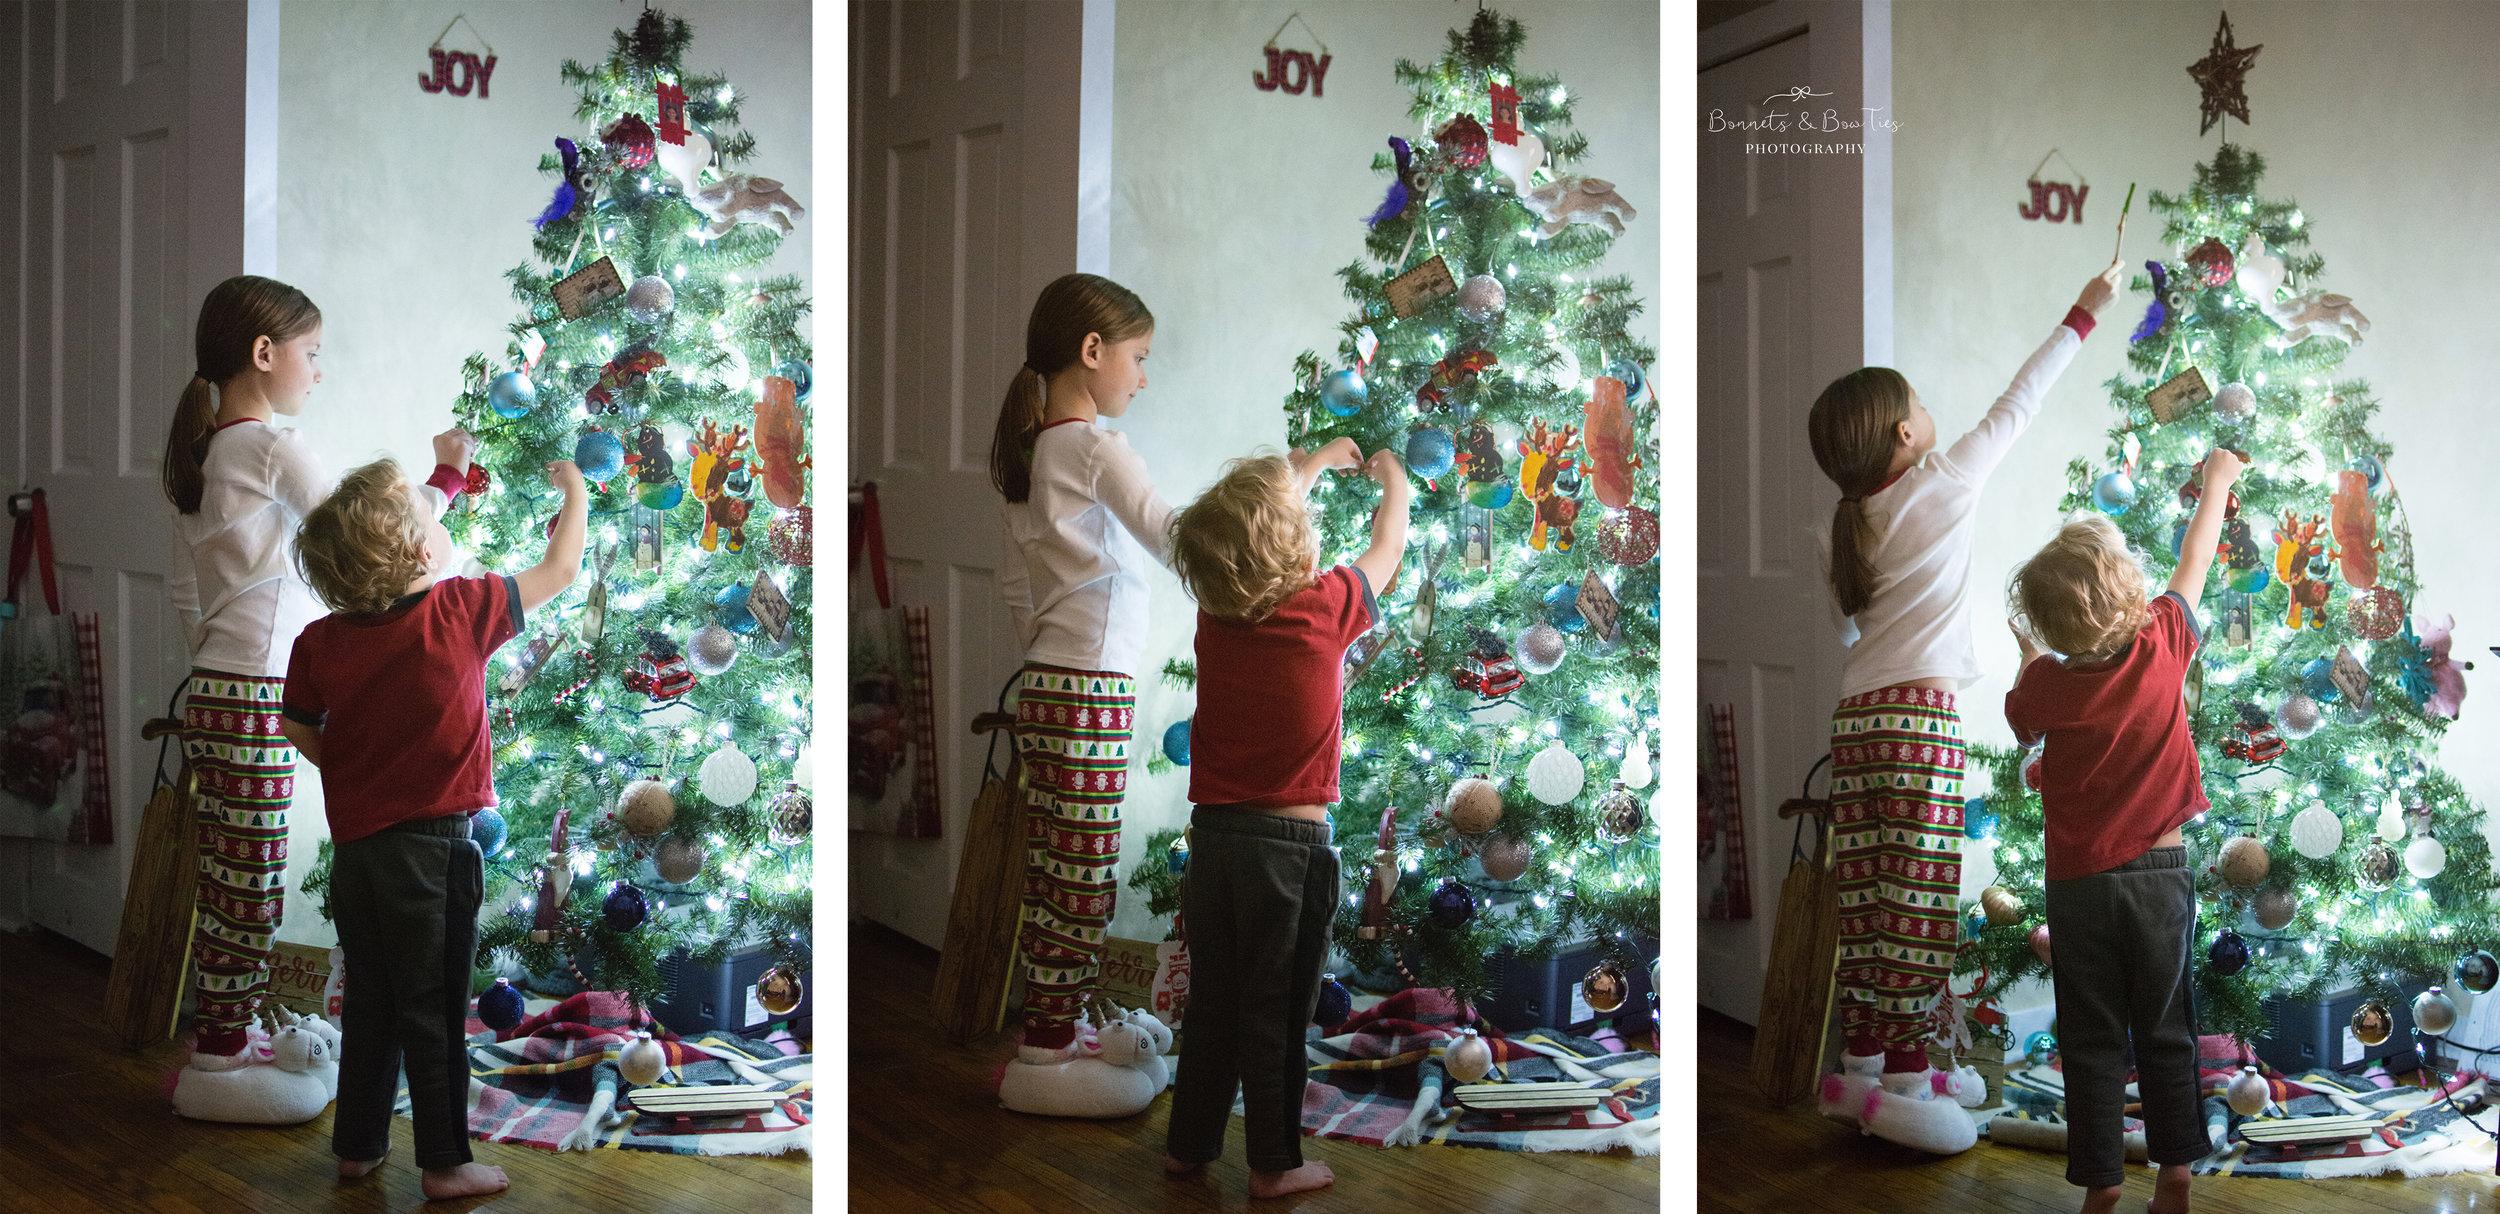 kids trimming tree.jpg